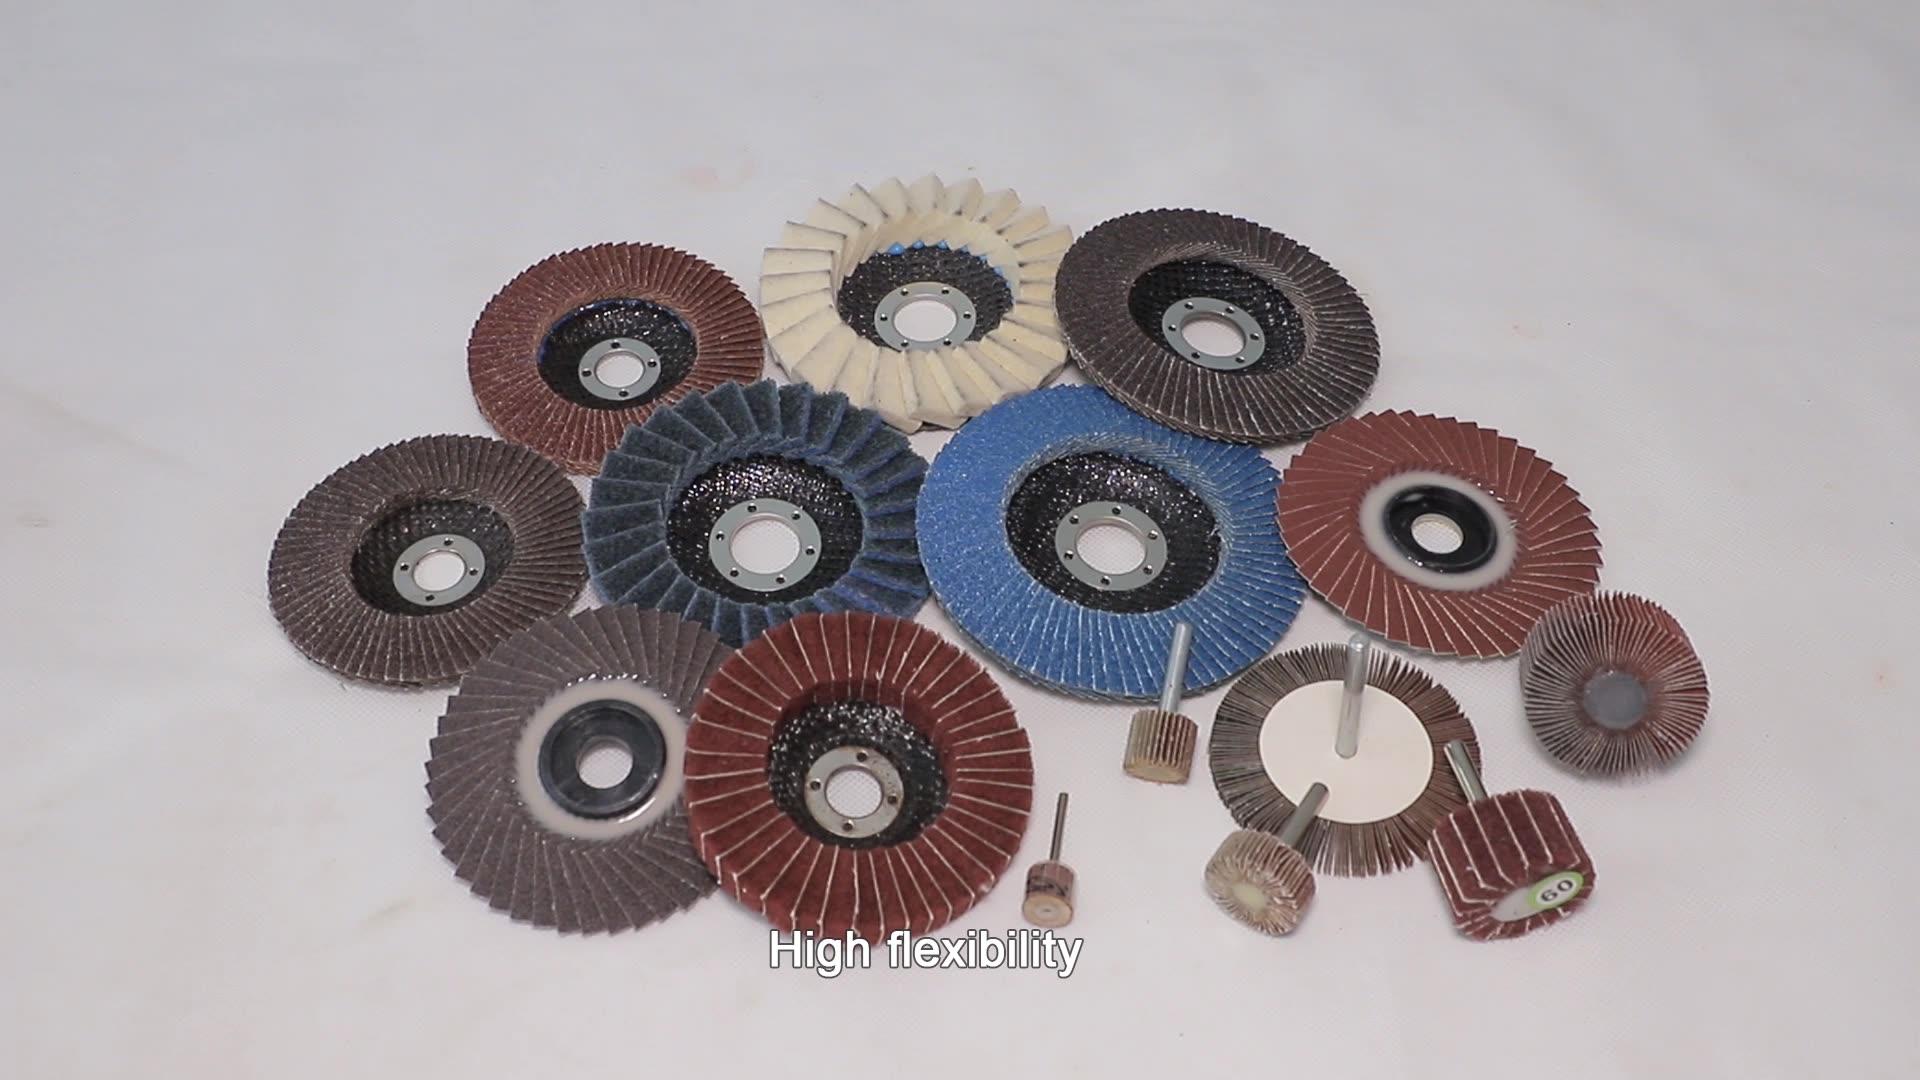 150mm sand paper abrasive sanding discs for metal polishing car body repair 150mm abrasive polyester film